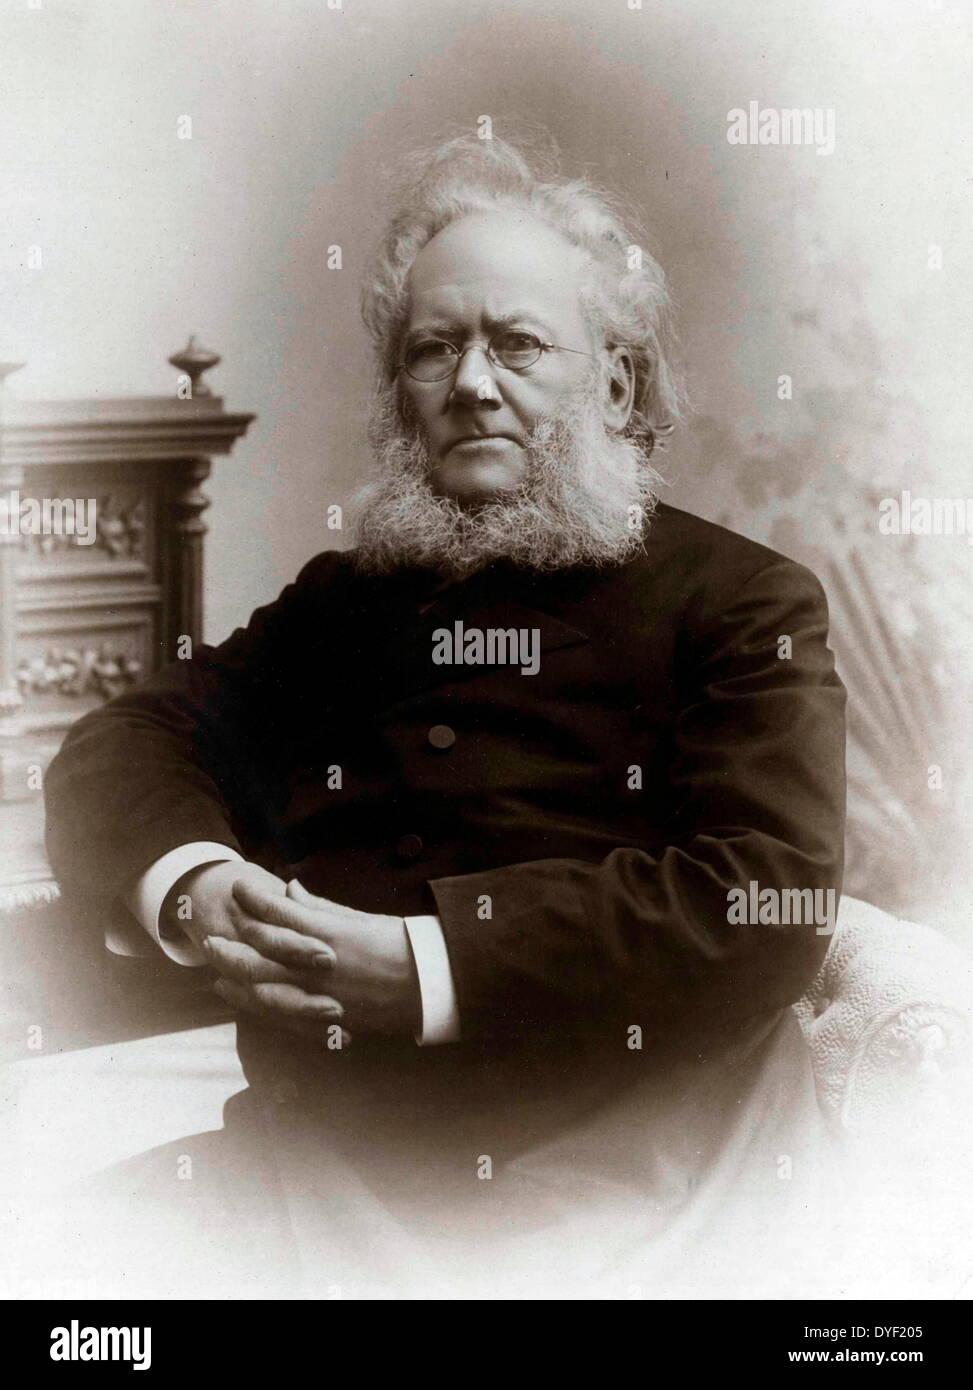 Photograph of Henrik Johan Ibsen, 19th-century Norwegian playwright, poet, and theatre director. - Stock Image